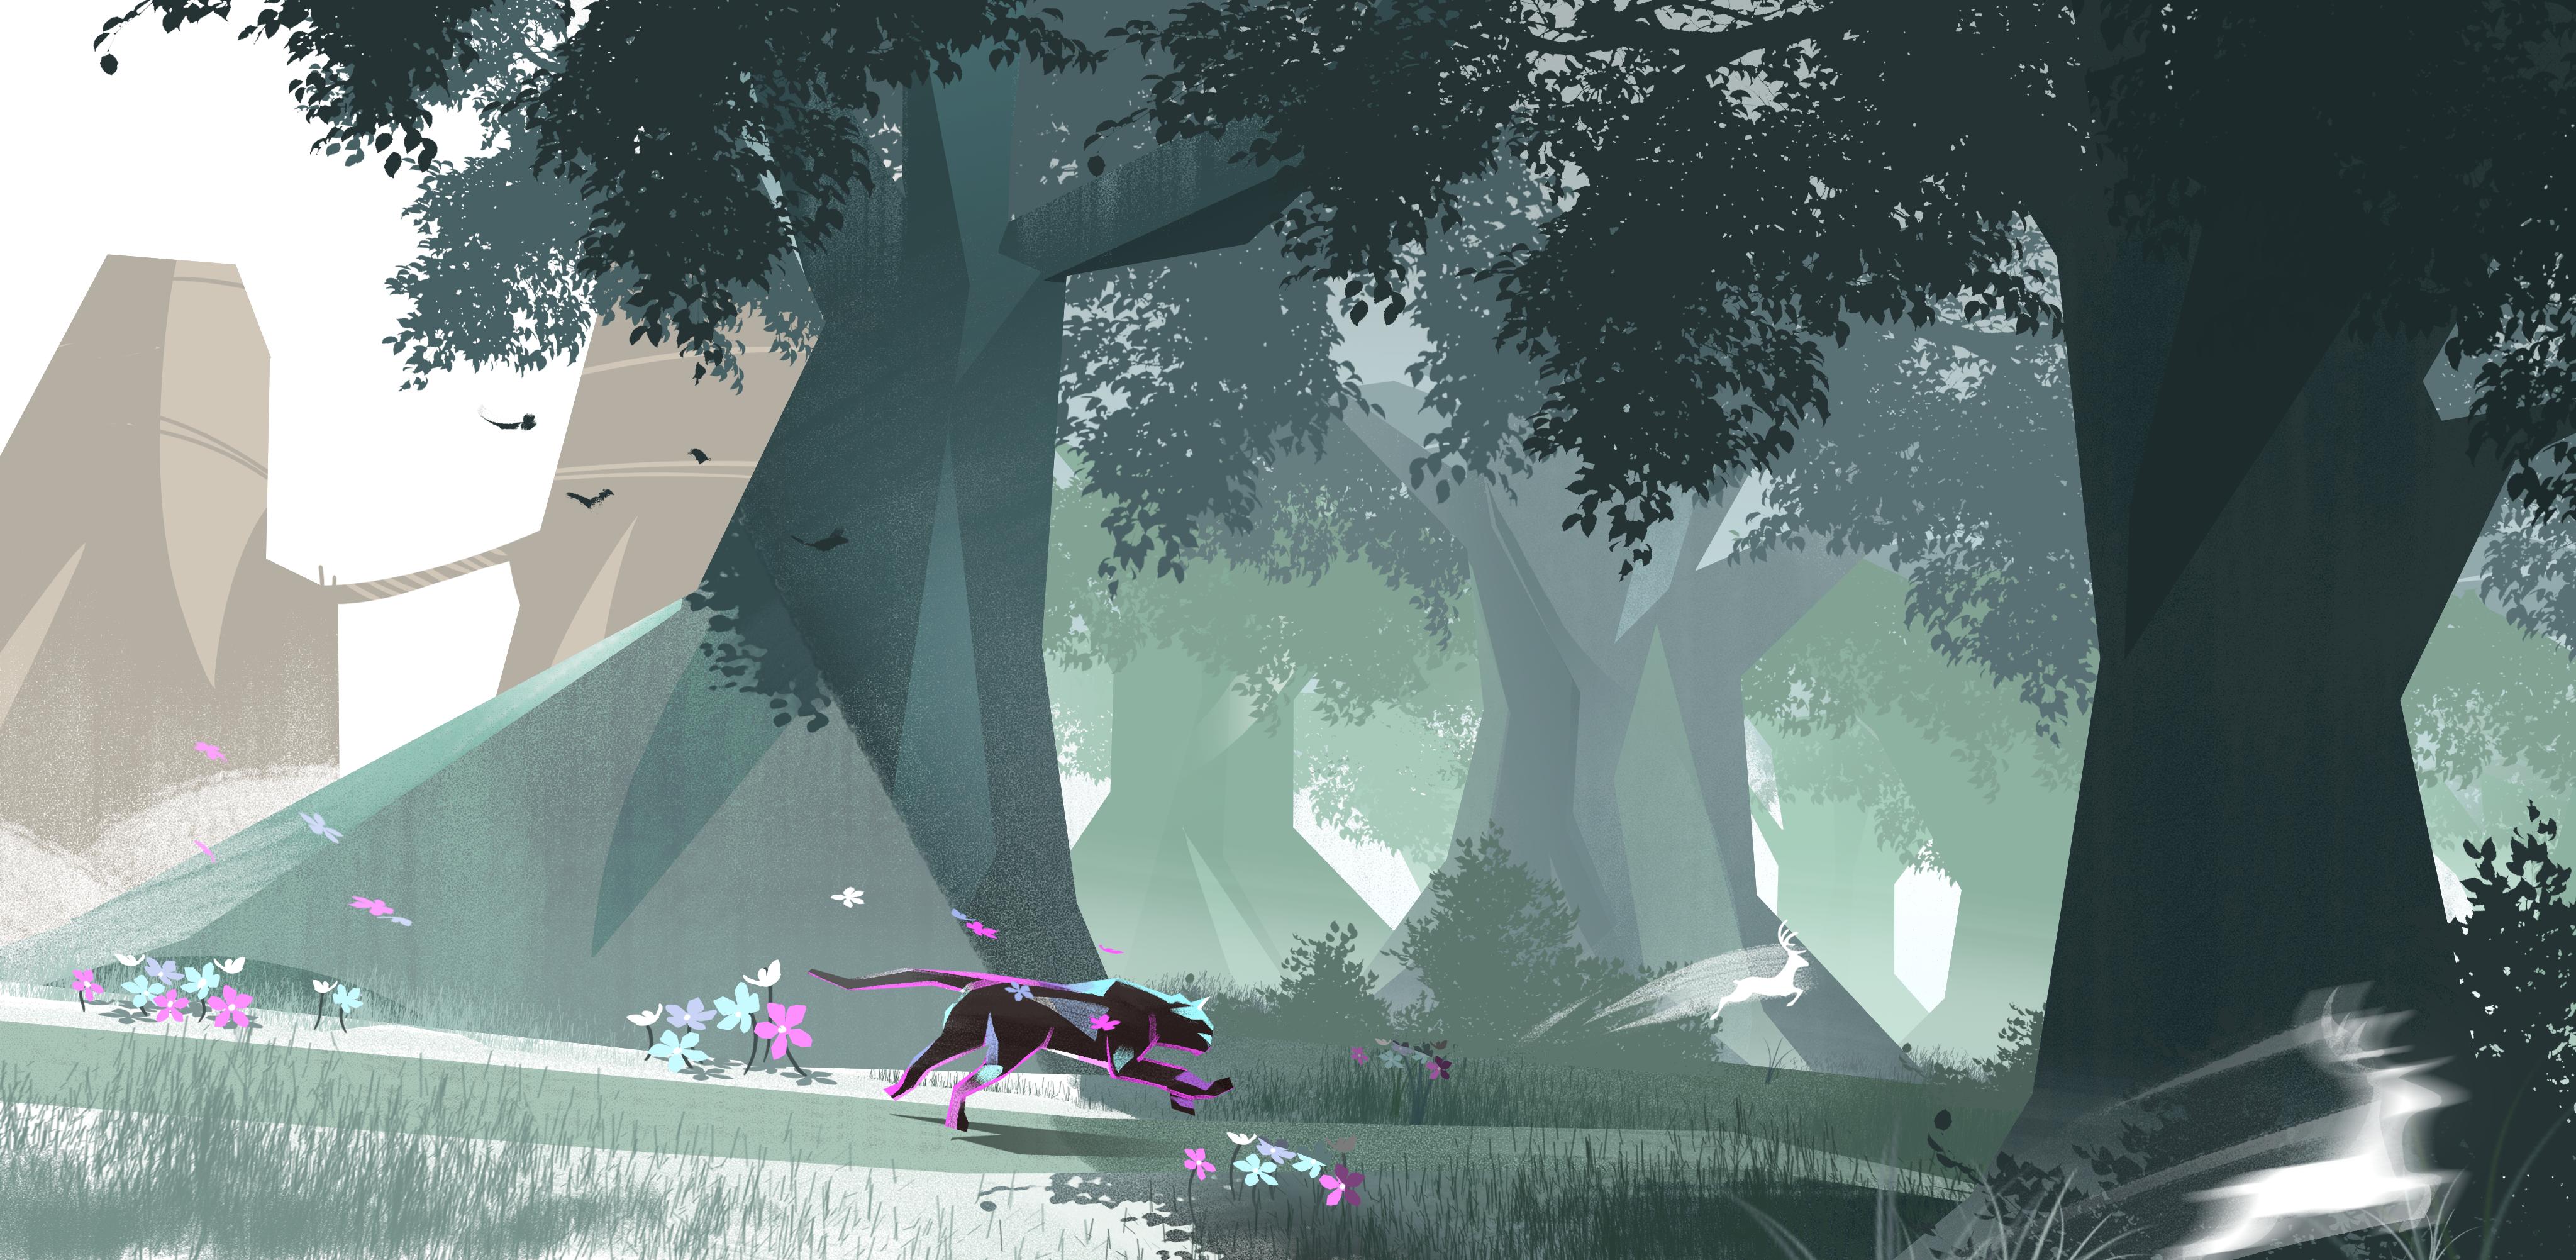 puma_forest_environment_dark